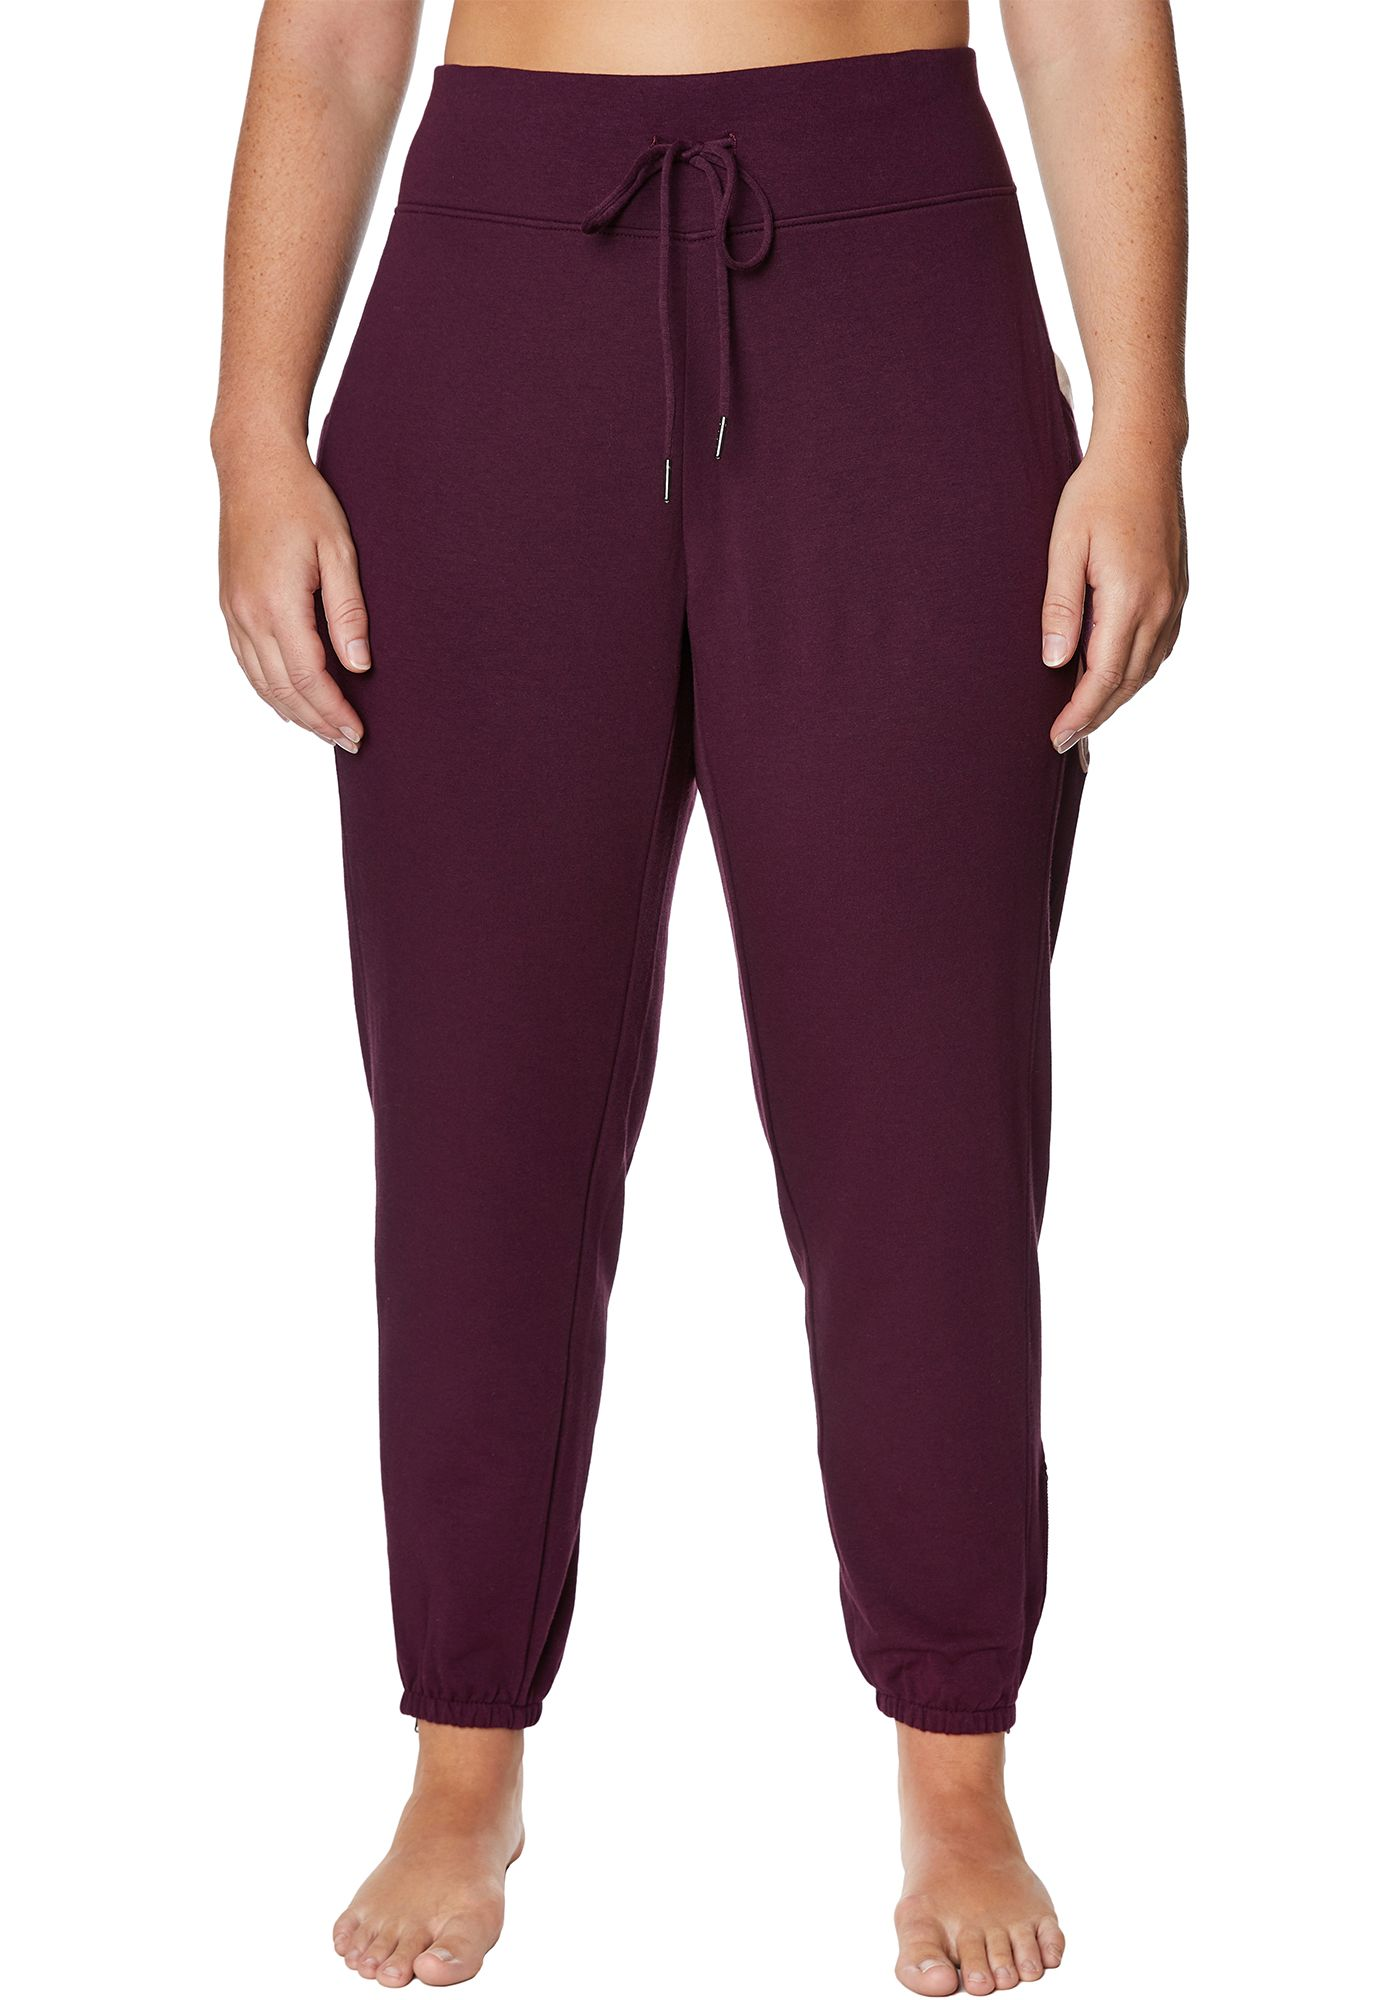 Betsey Johnson Women's Plus Size Chevron Colorblock Sweatpants